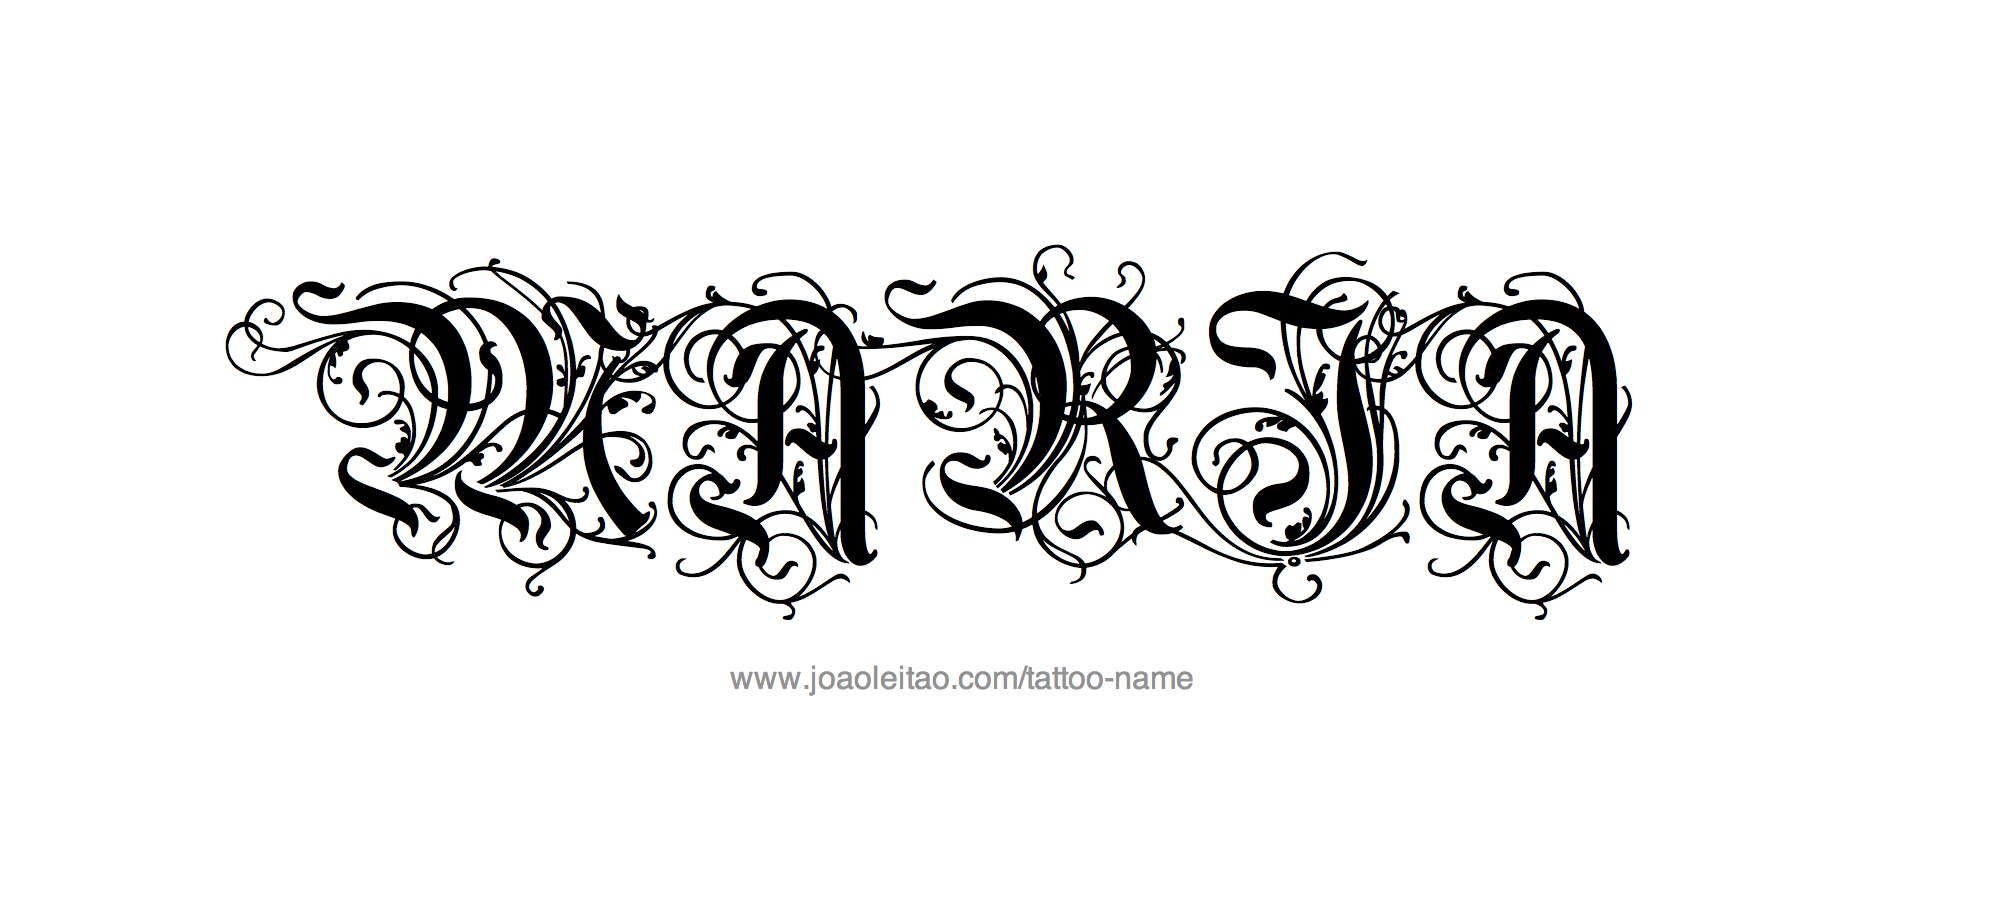 maria names directory tattoo design female name maria 20 22 png. Black Bedroom Furniture Sets. Home Design Ideas